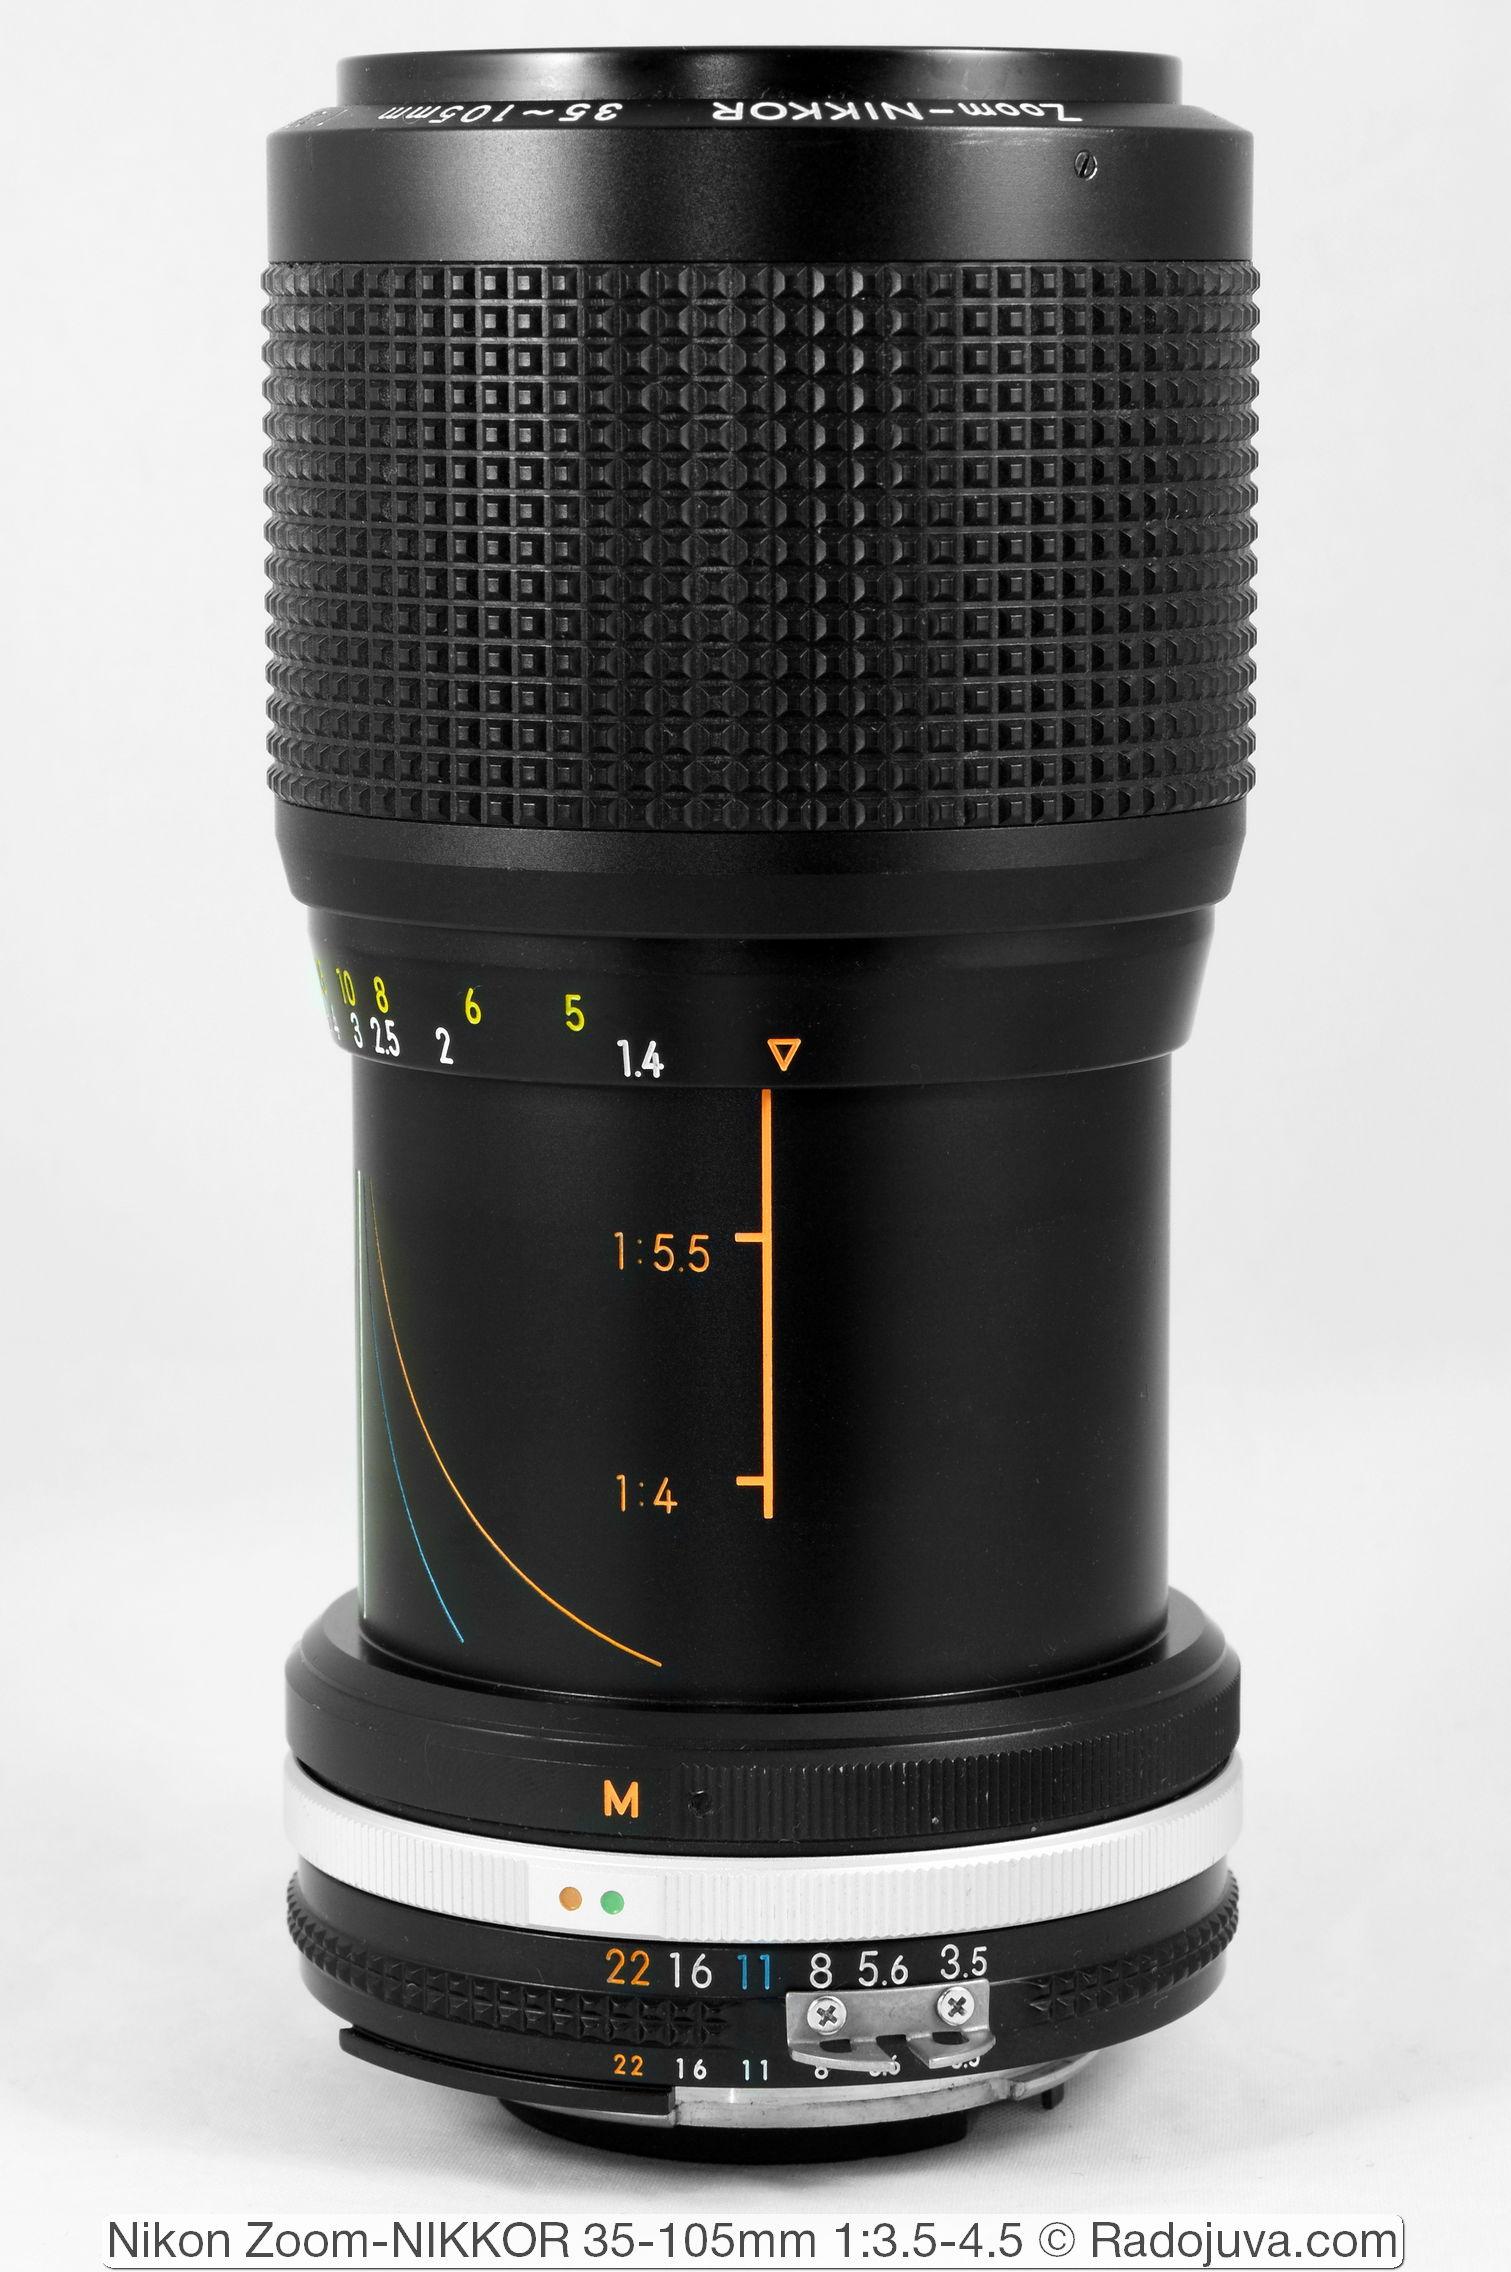 Nikon Zoom-NIKKOR 35-105mm 1:3.5-4.5 AI-S